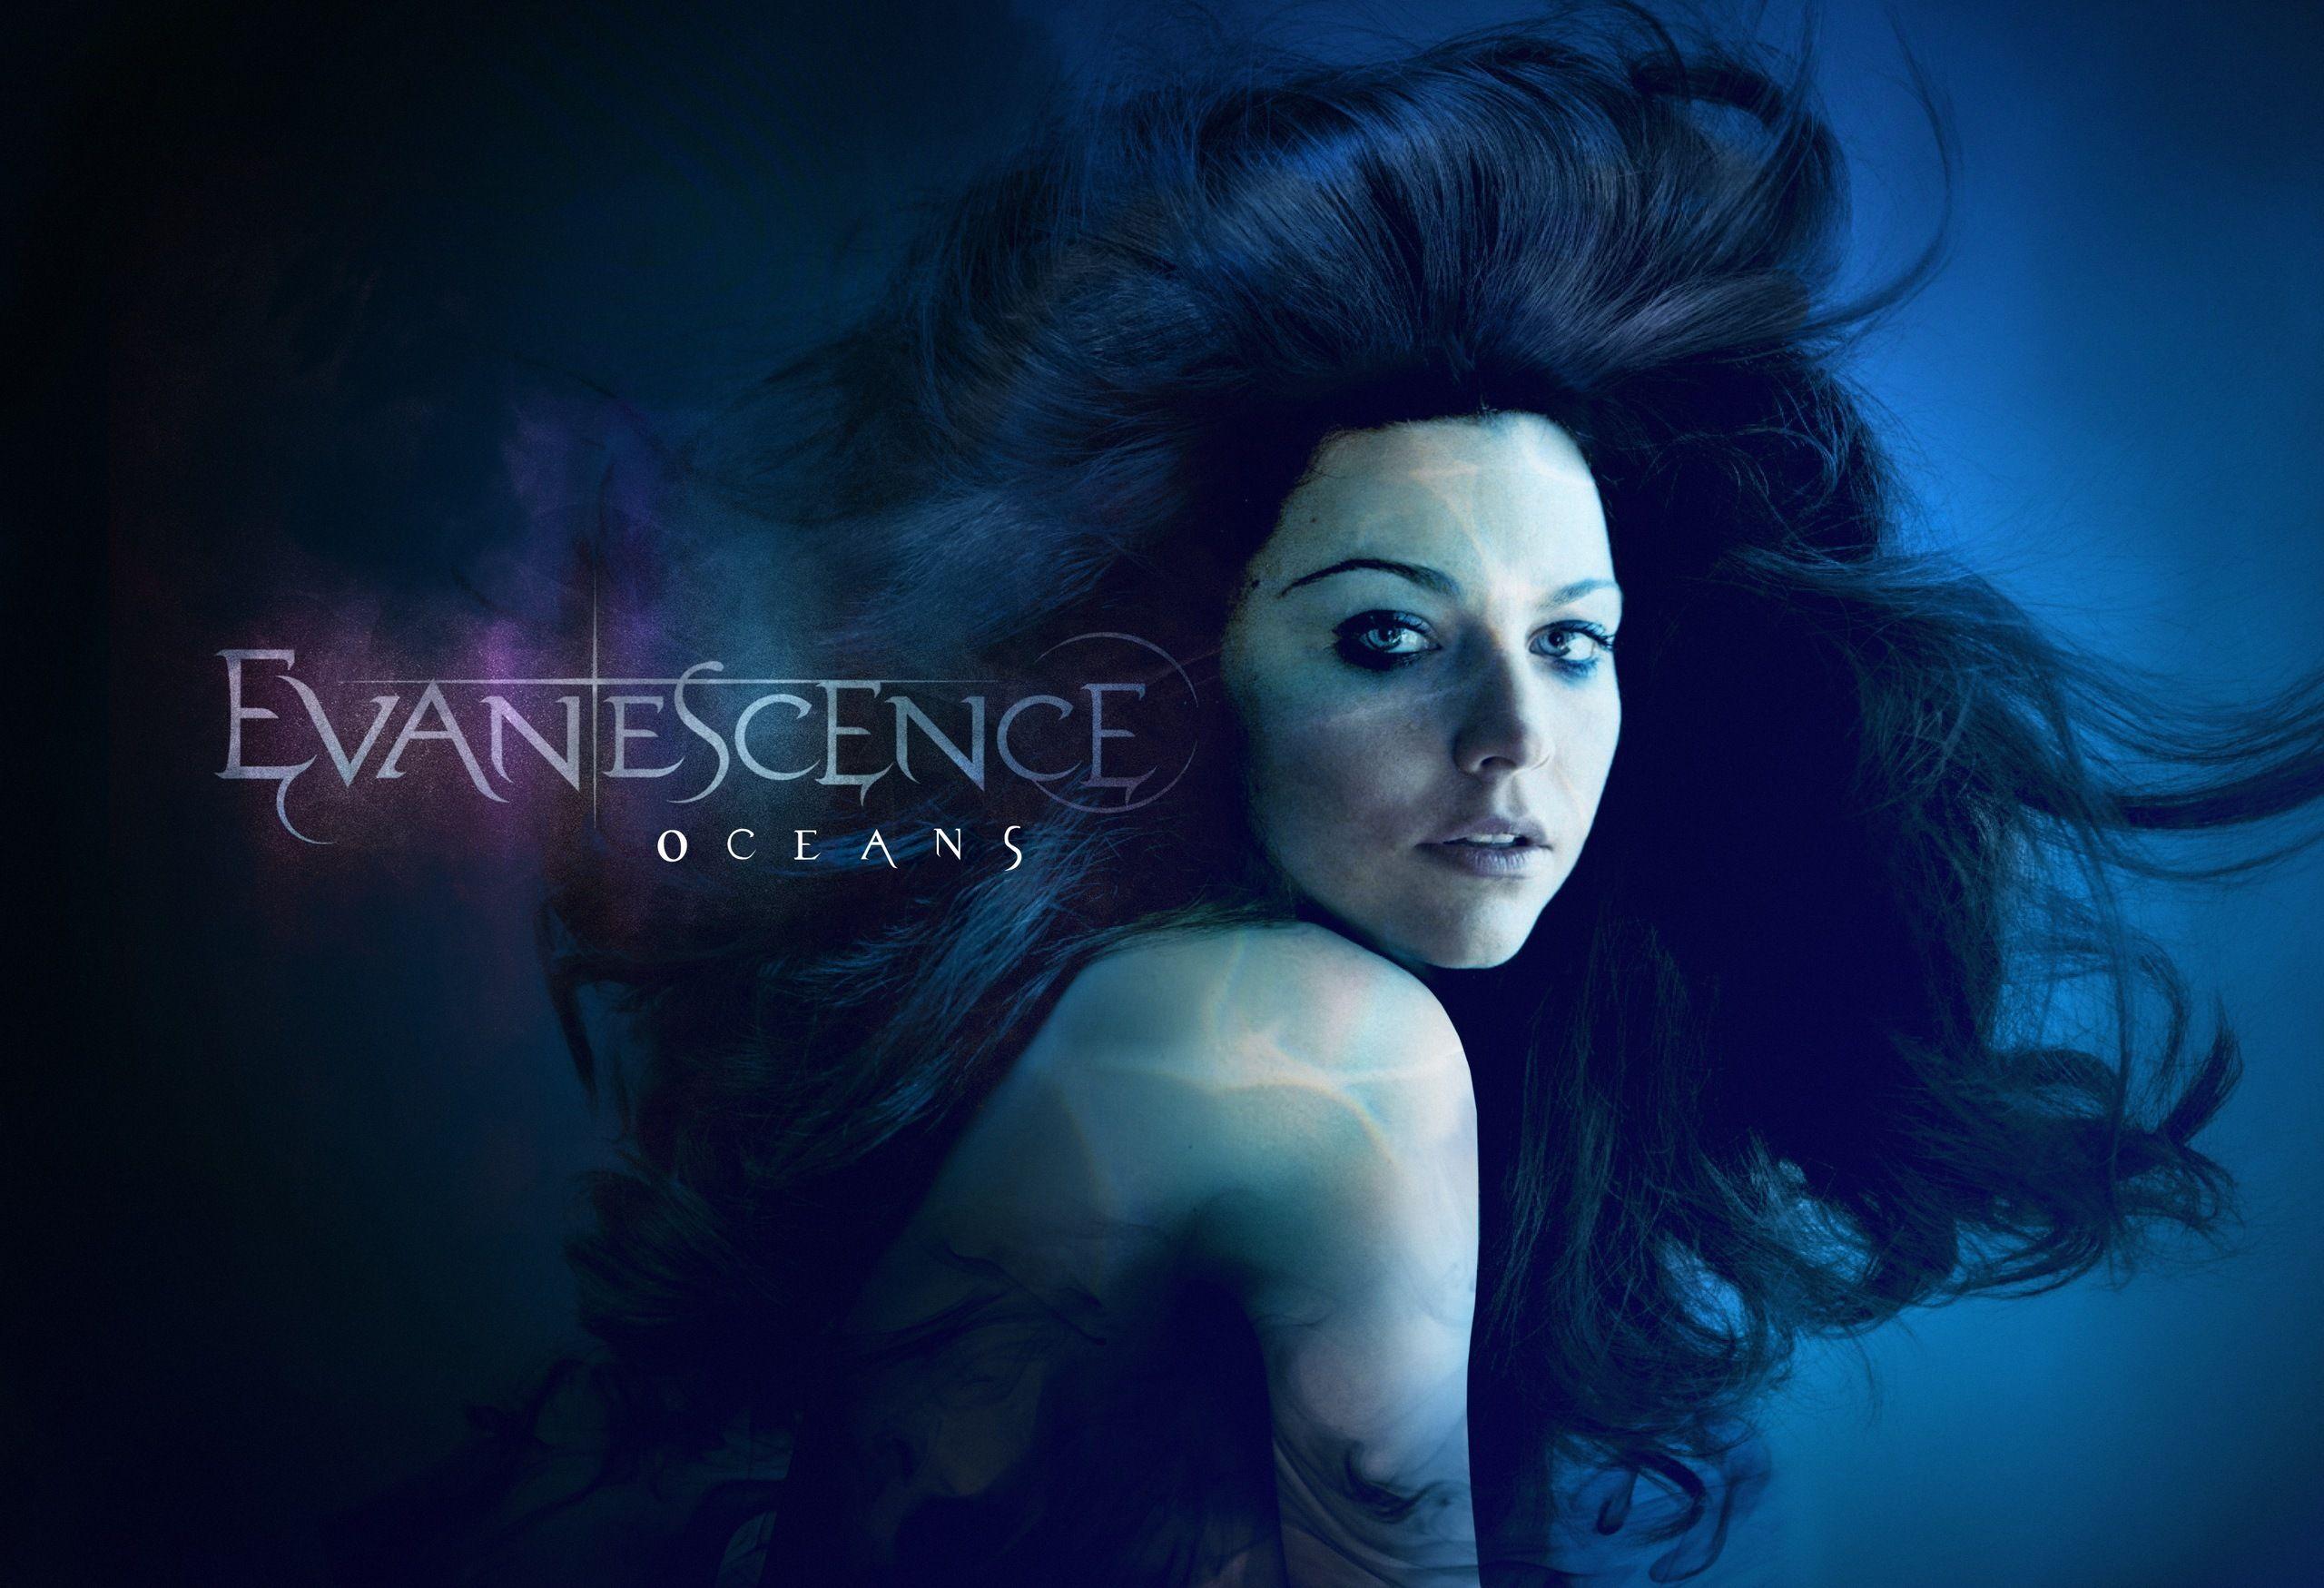 Desktophdwallpaper Org Evanescence Amy Lee Amy Lee Evanescence Amy lee singer hd wallpapers